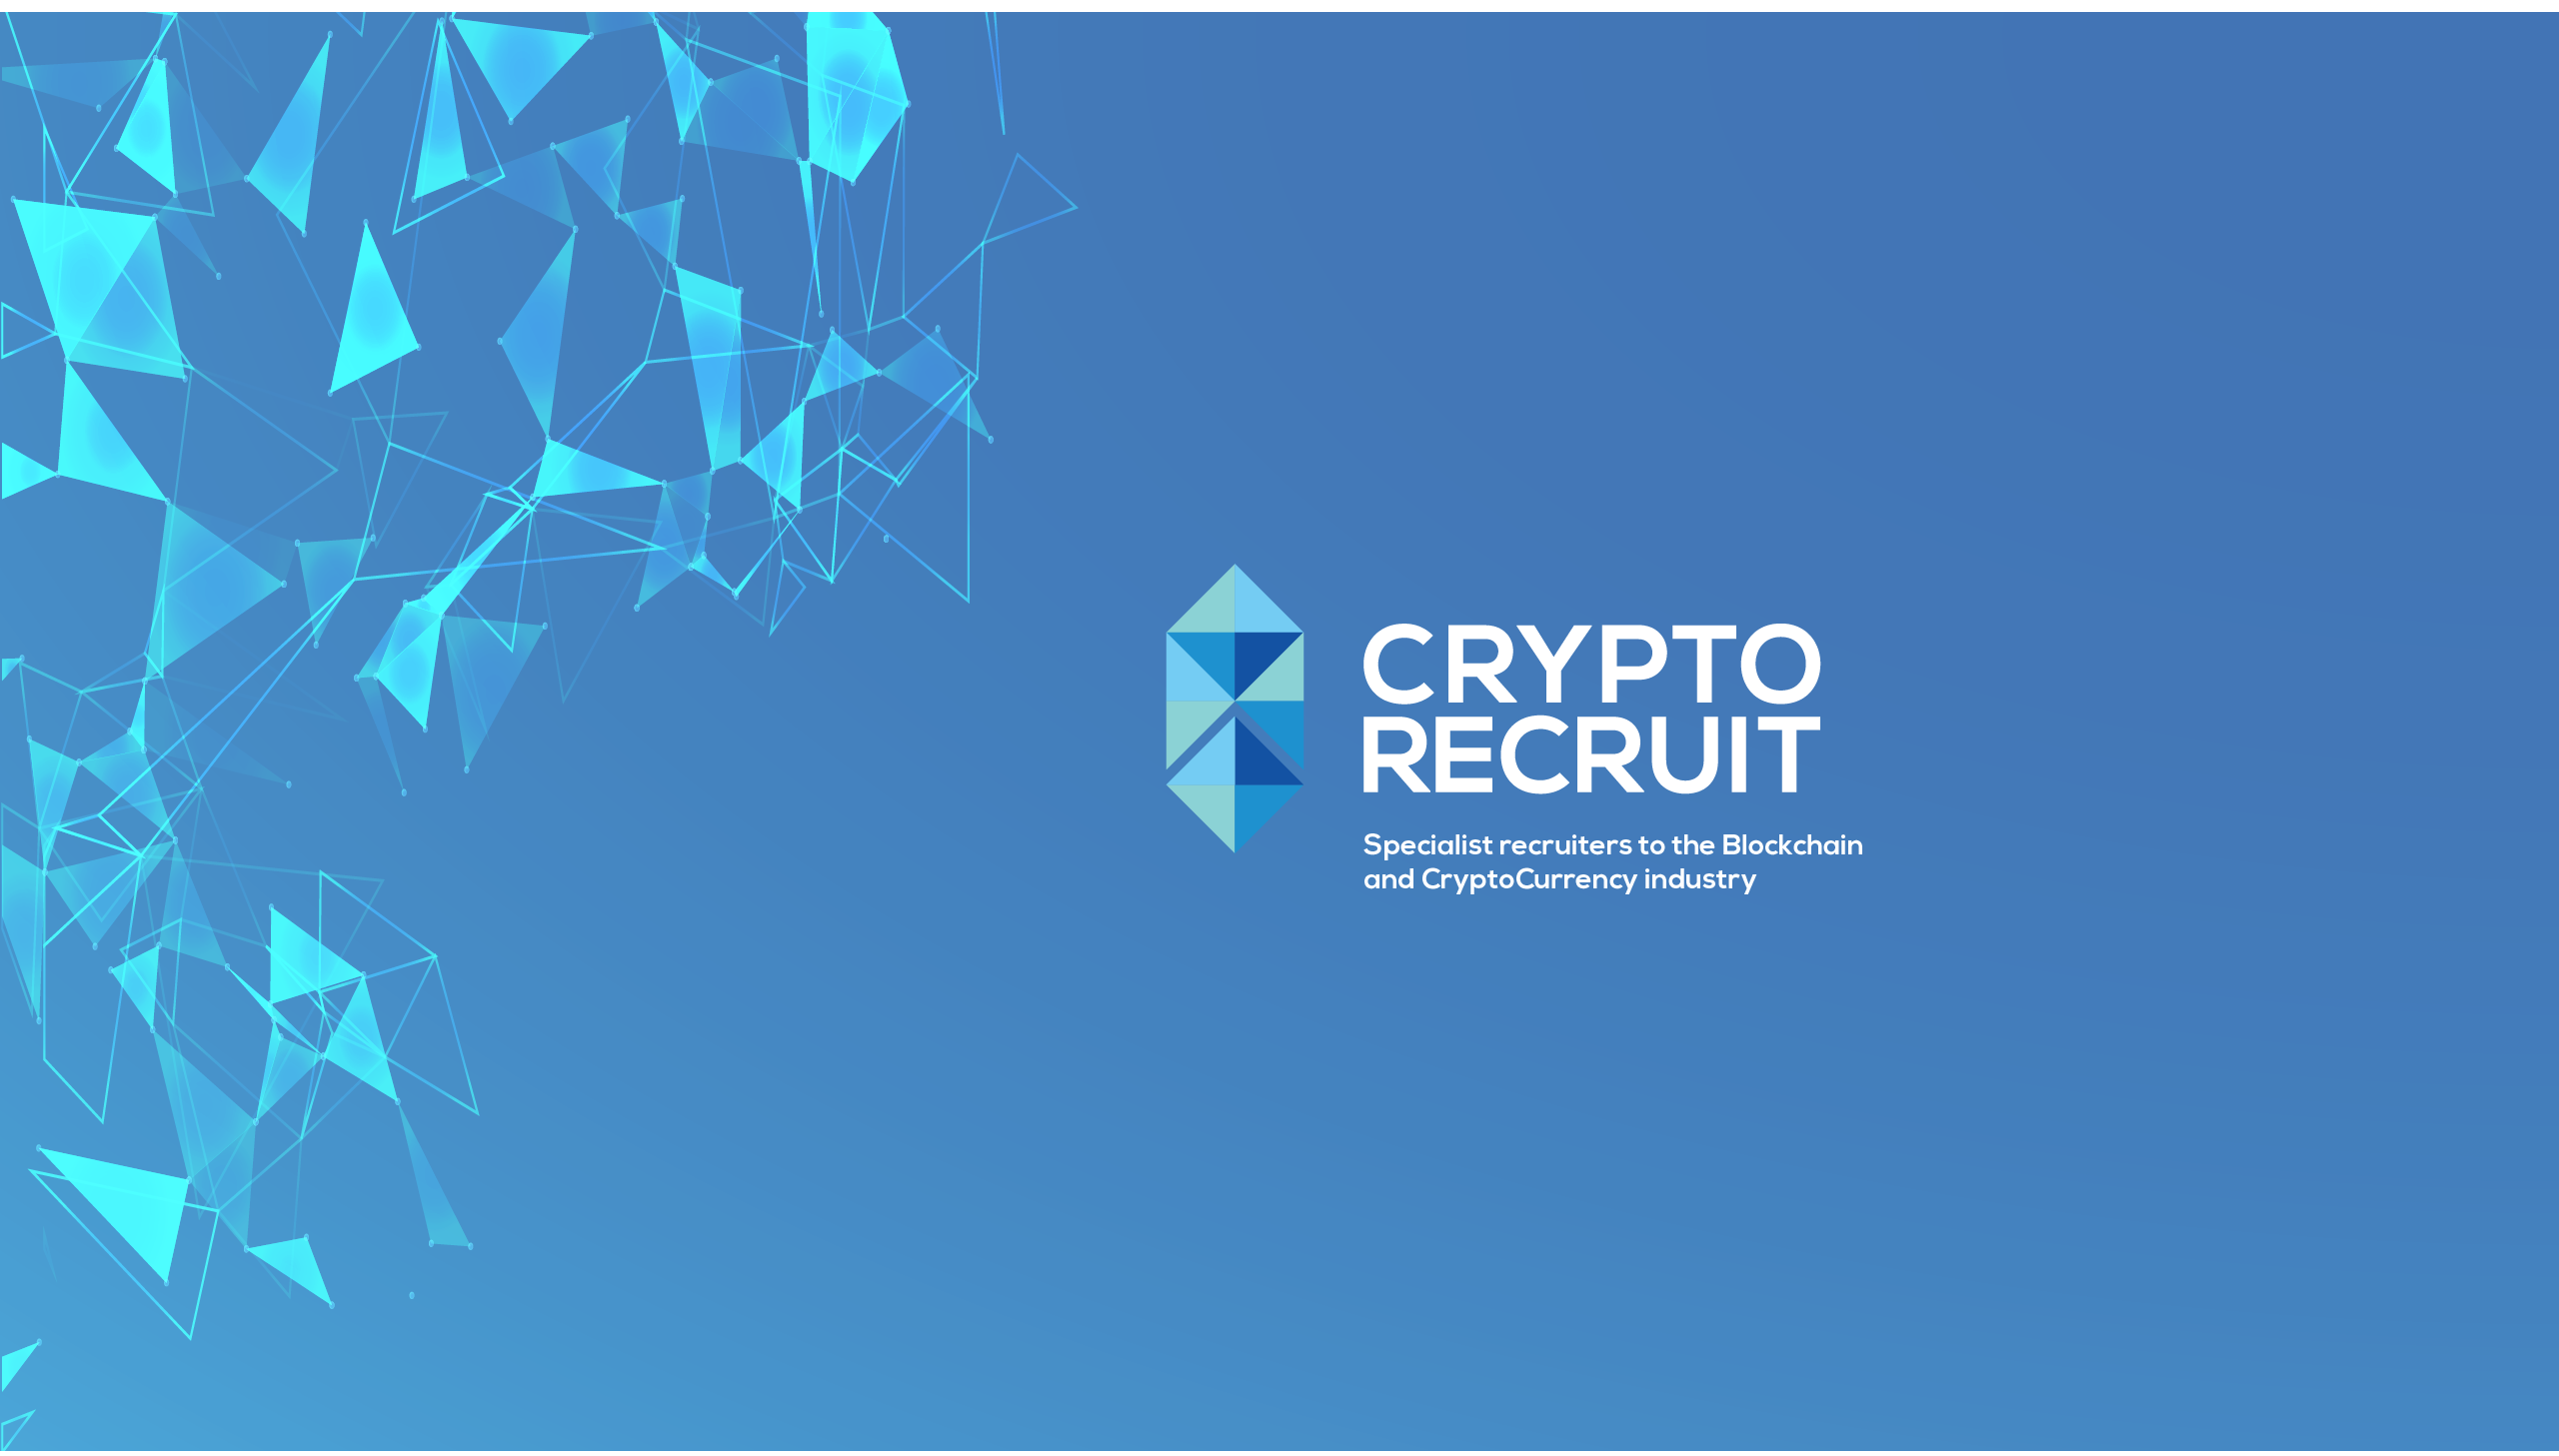 Crypto Recruit